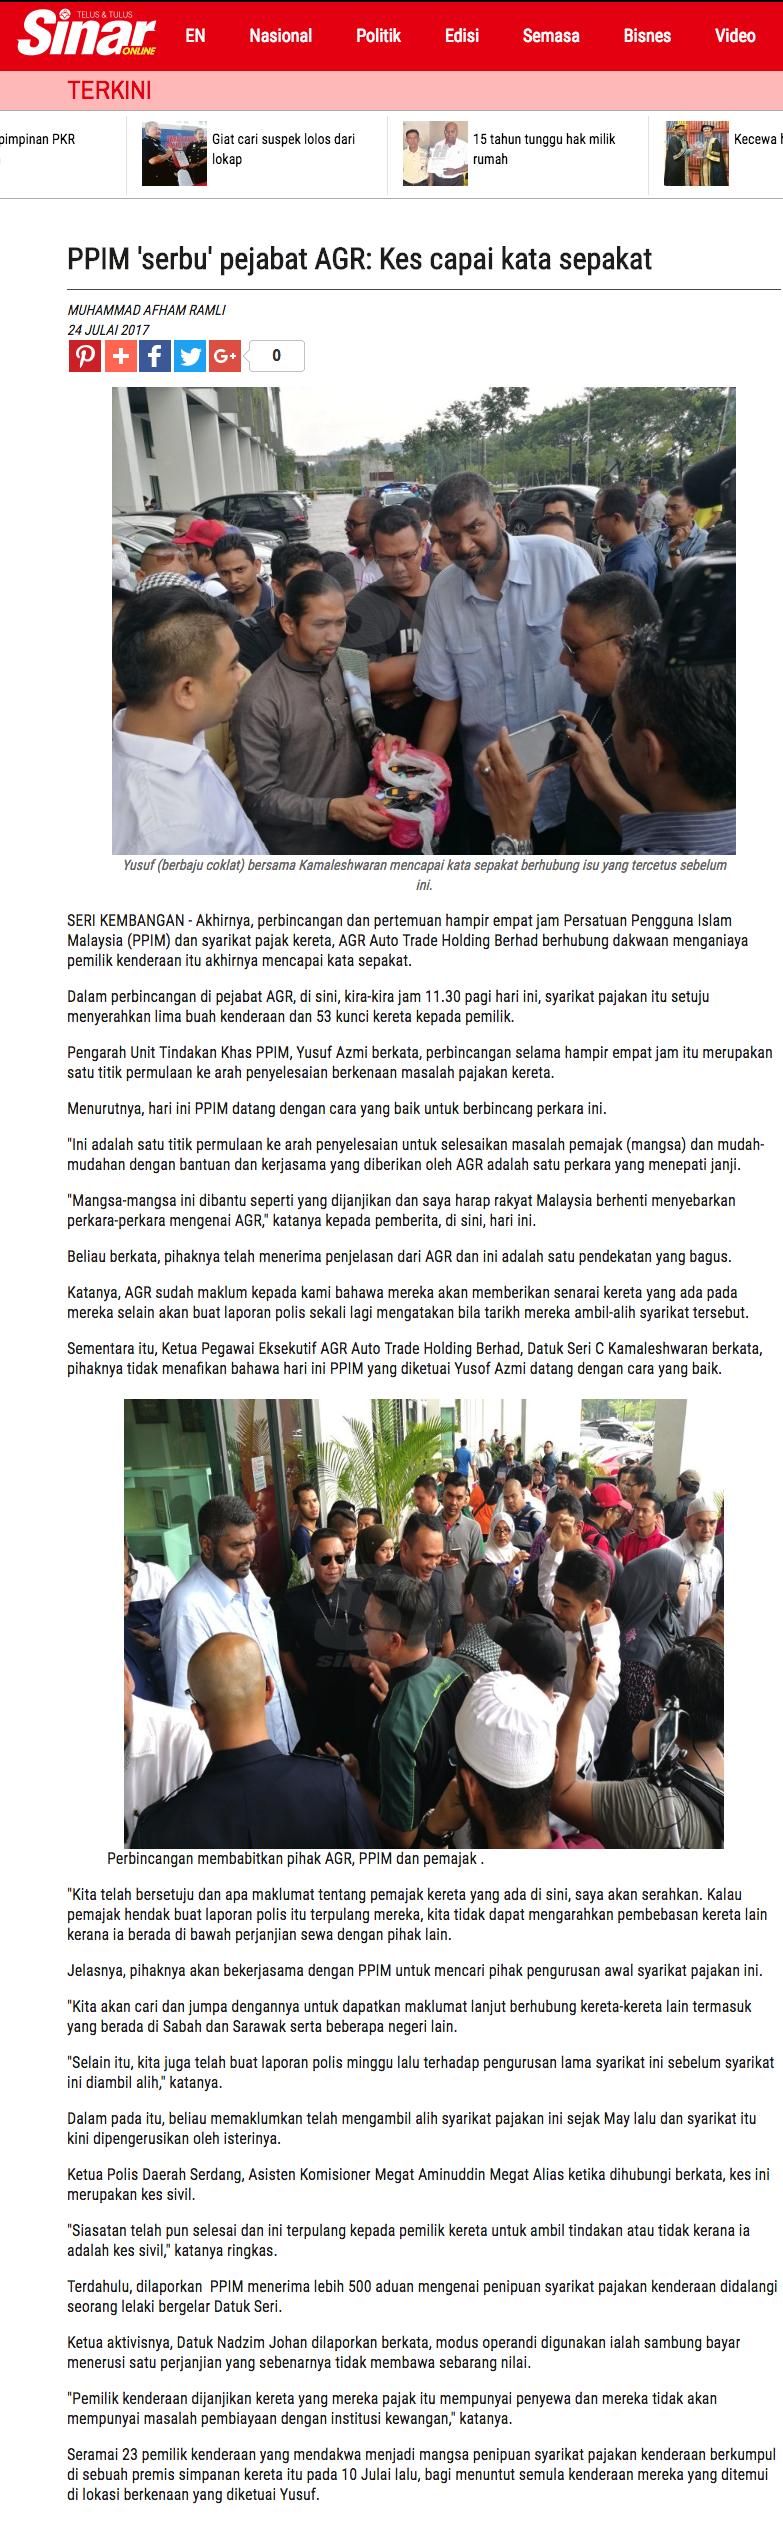 PPIM serbu pejabat AGR Kes capai kata sepakat Semasa Sinar Harian